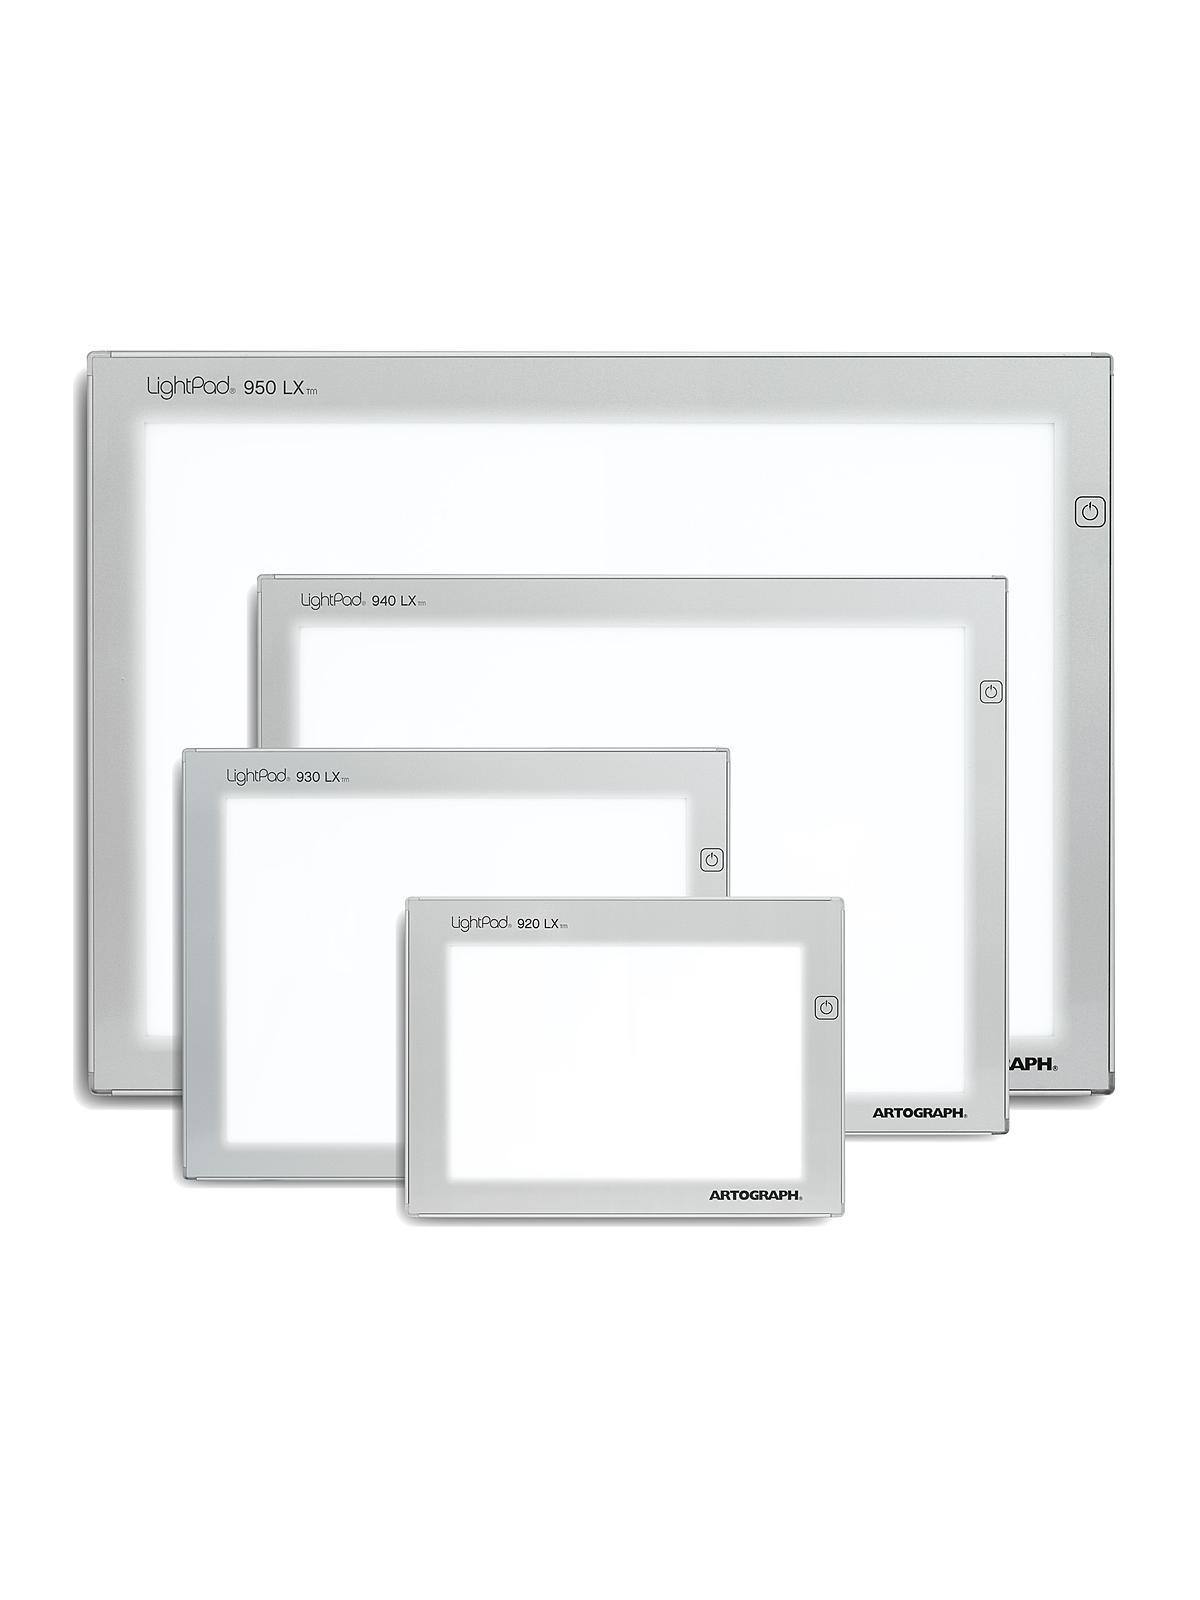 Artograph - LightPad Light boxes